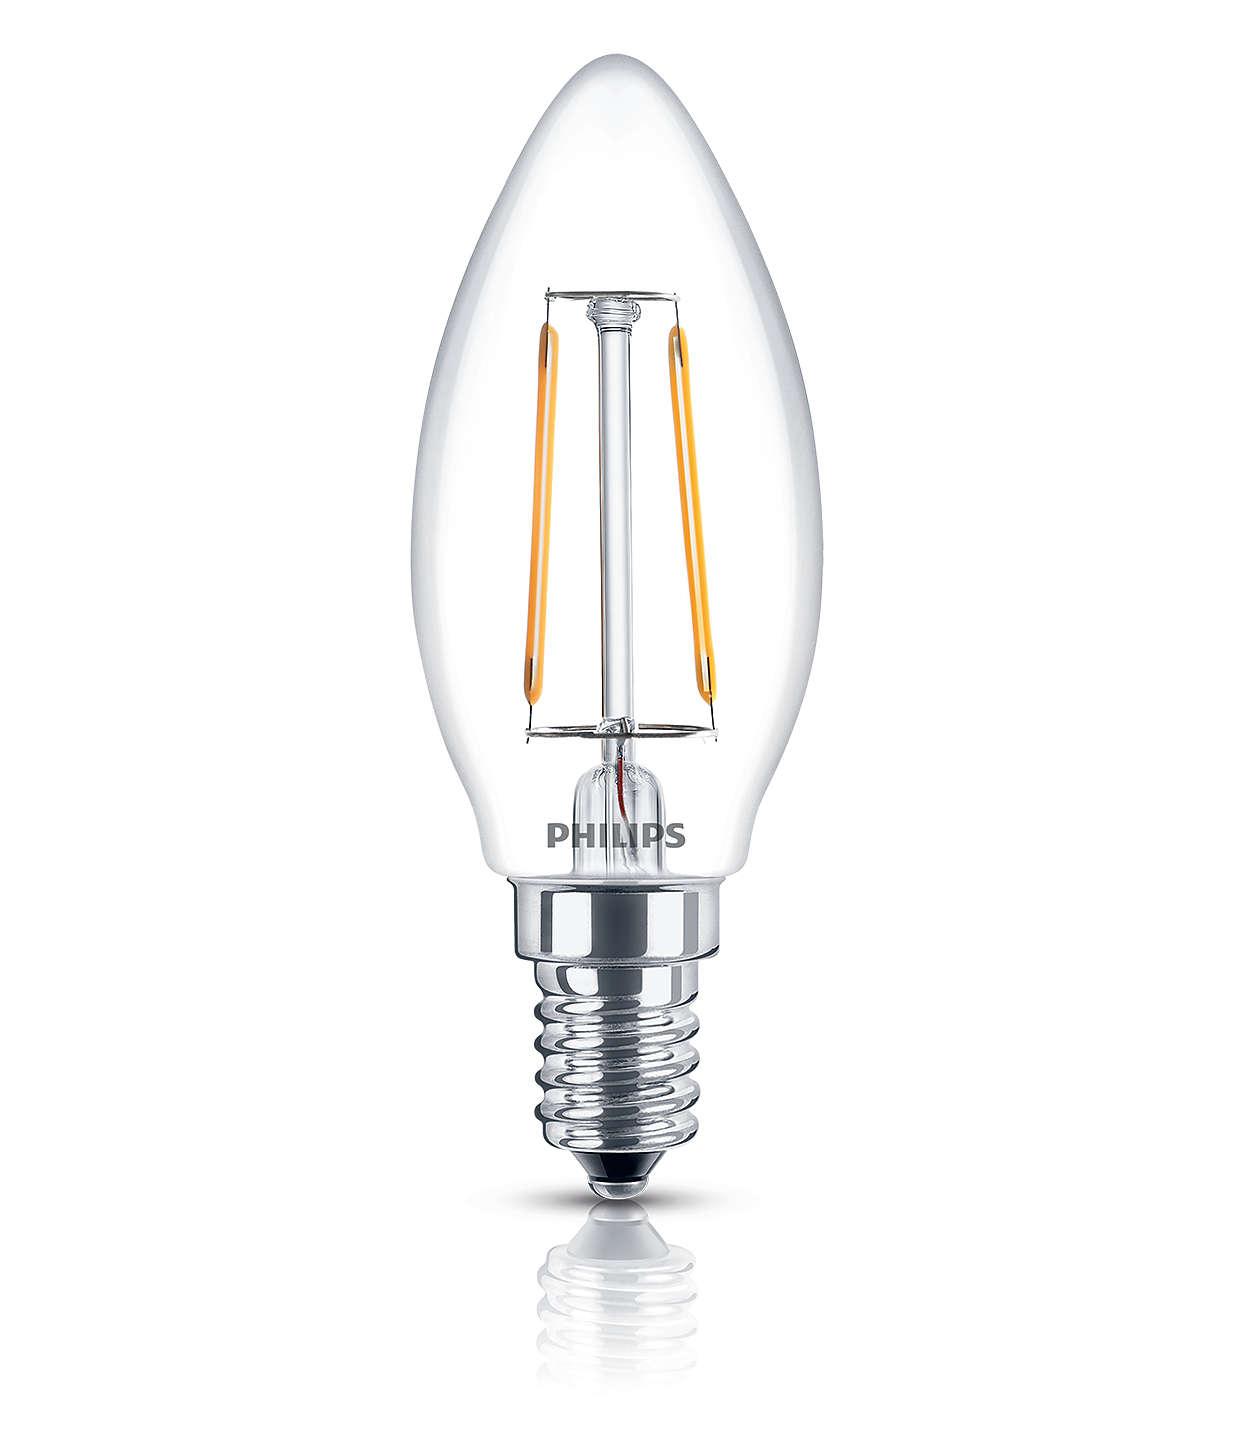 4 x Philips 2.3W 25W E14 SES Small Screw Candle LED Retro Lamp Bulb Warm White